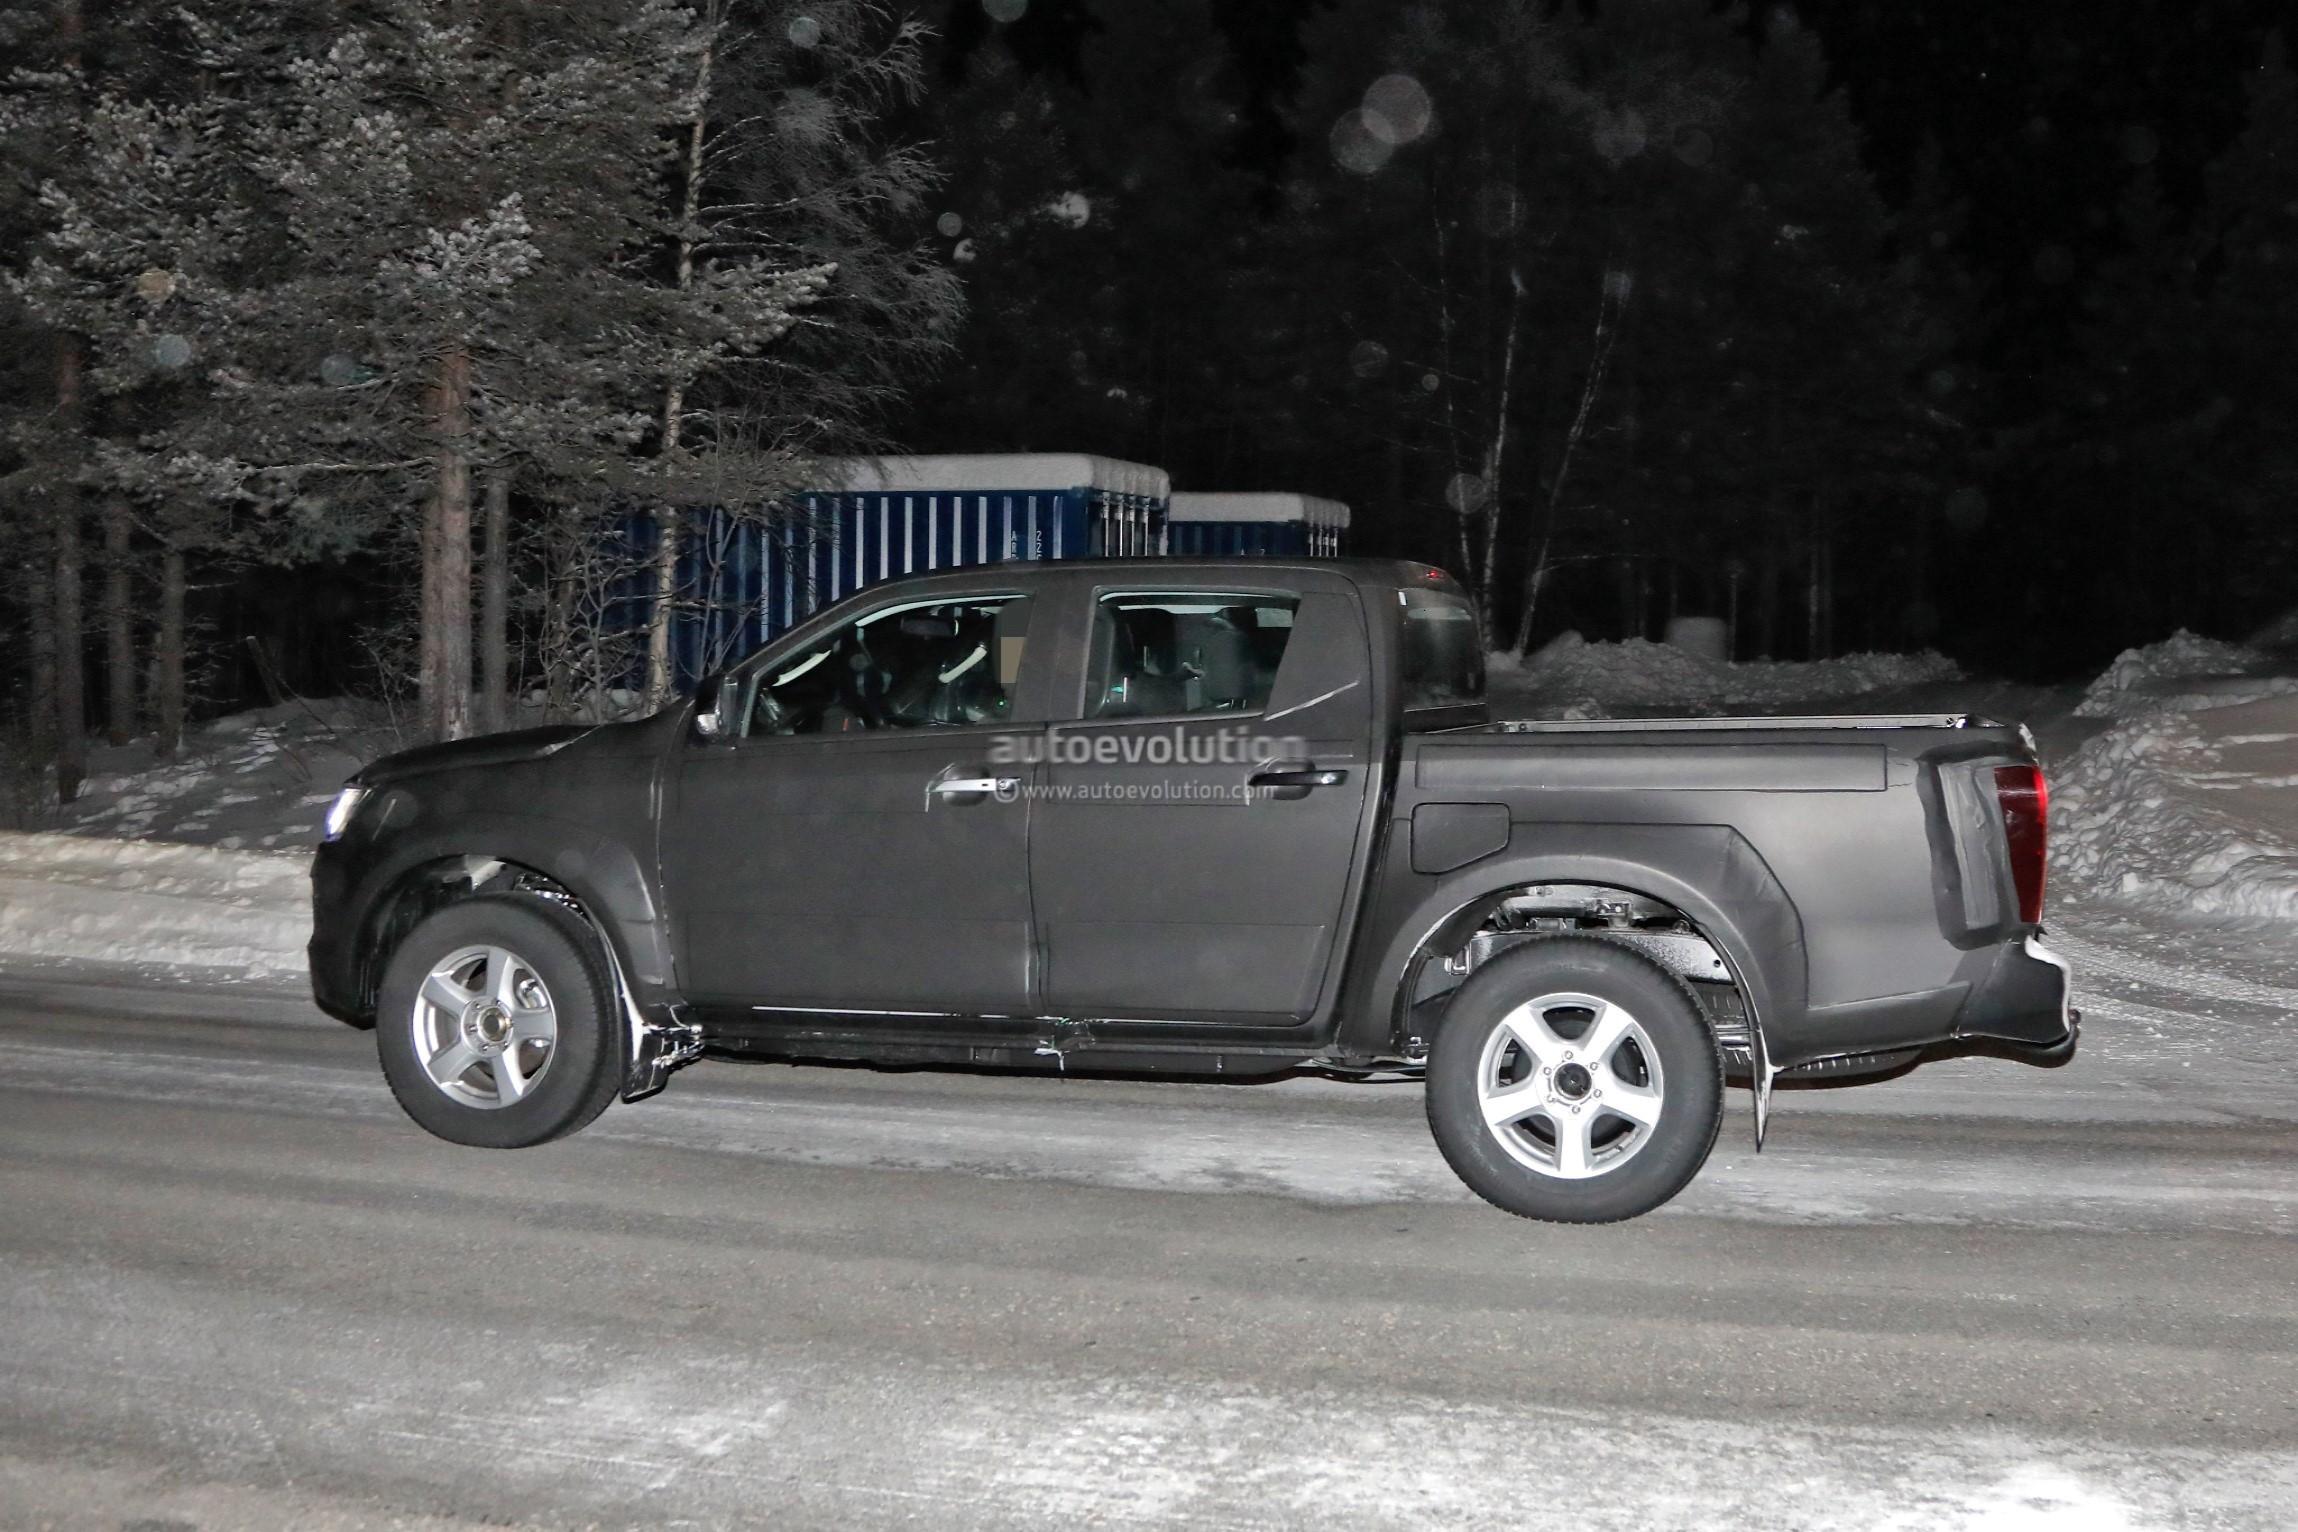 2020 Isuzu D-Max Pickup Truck Spied With Full-LED Headlights